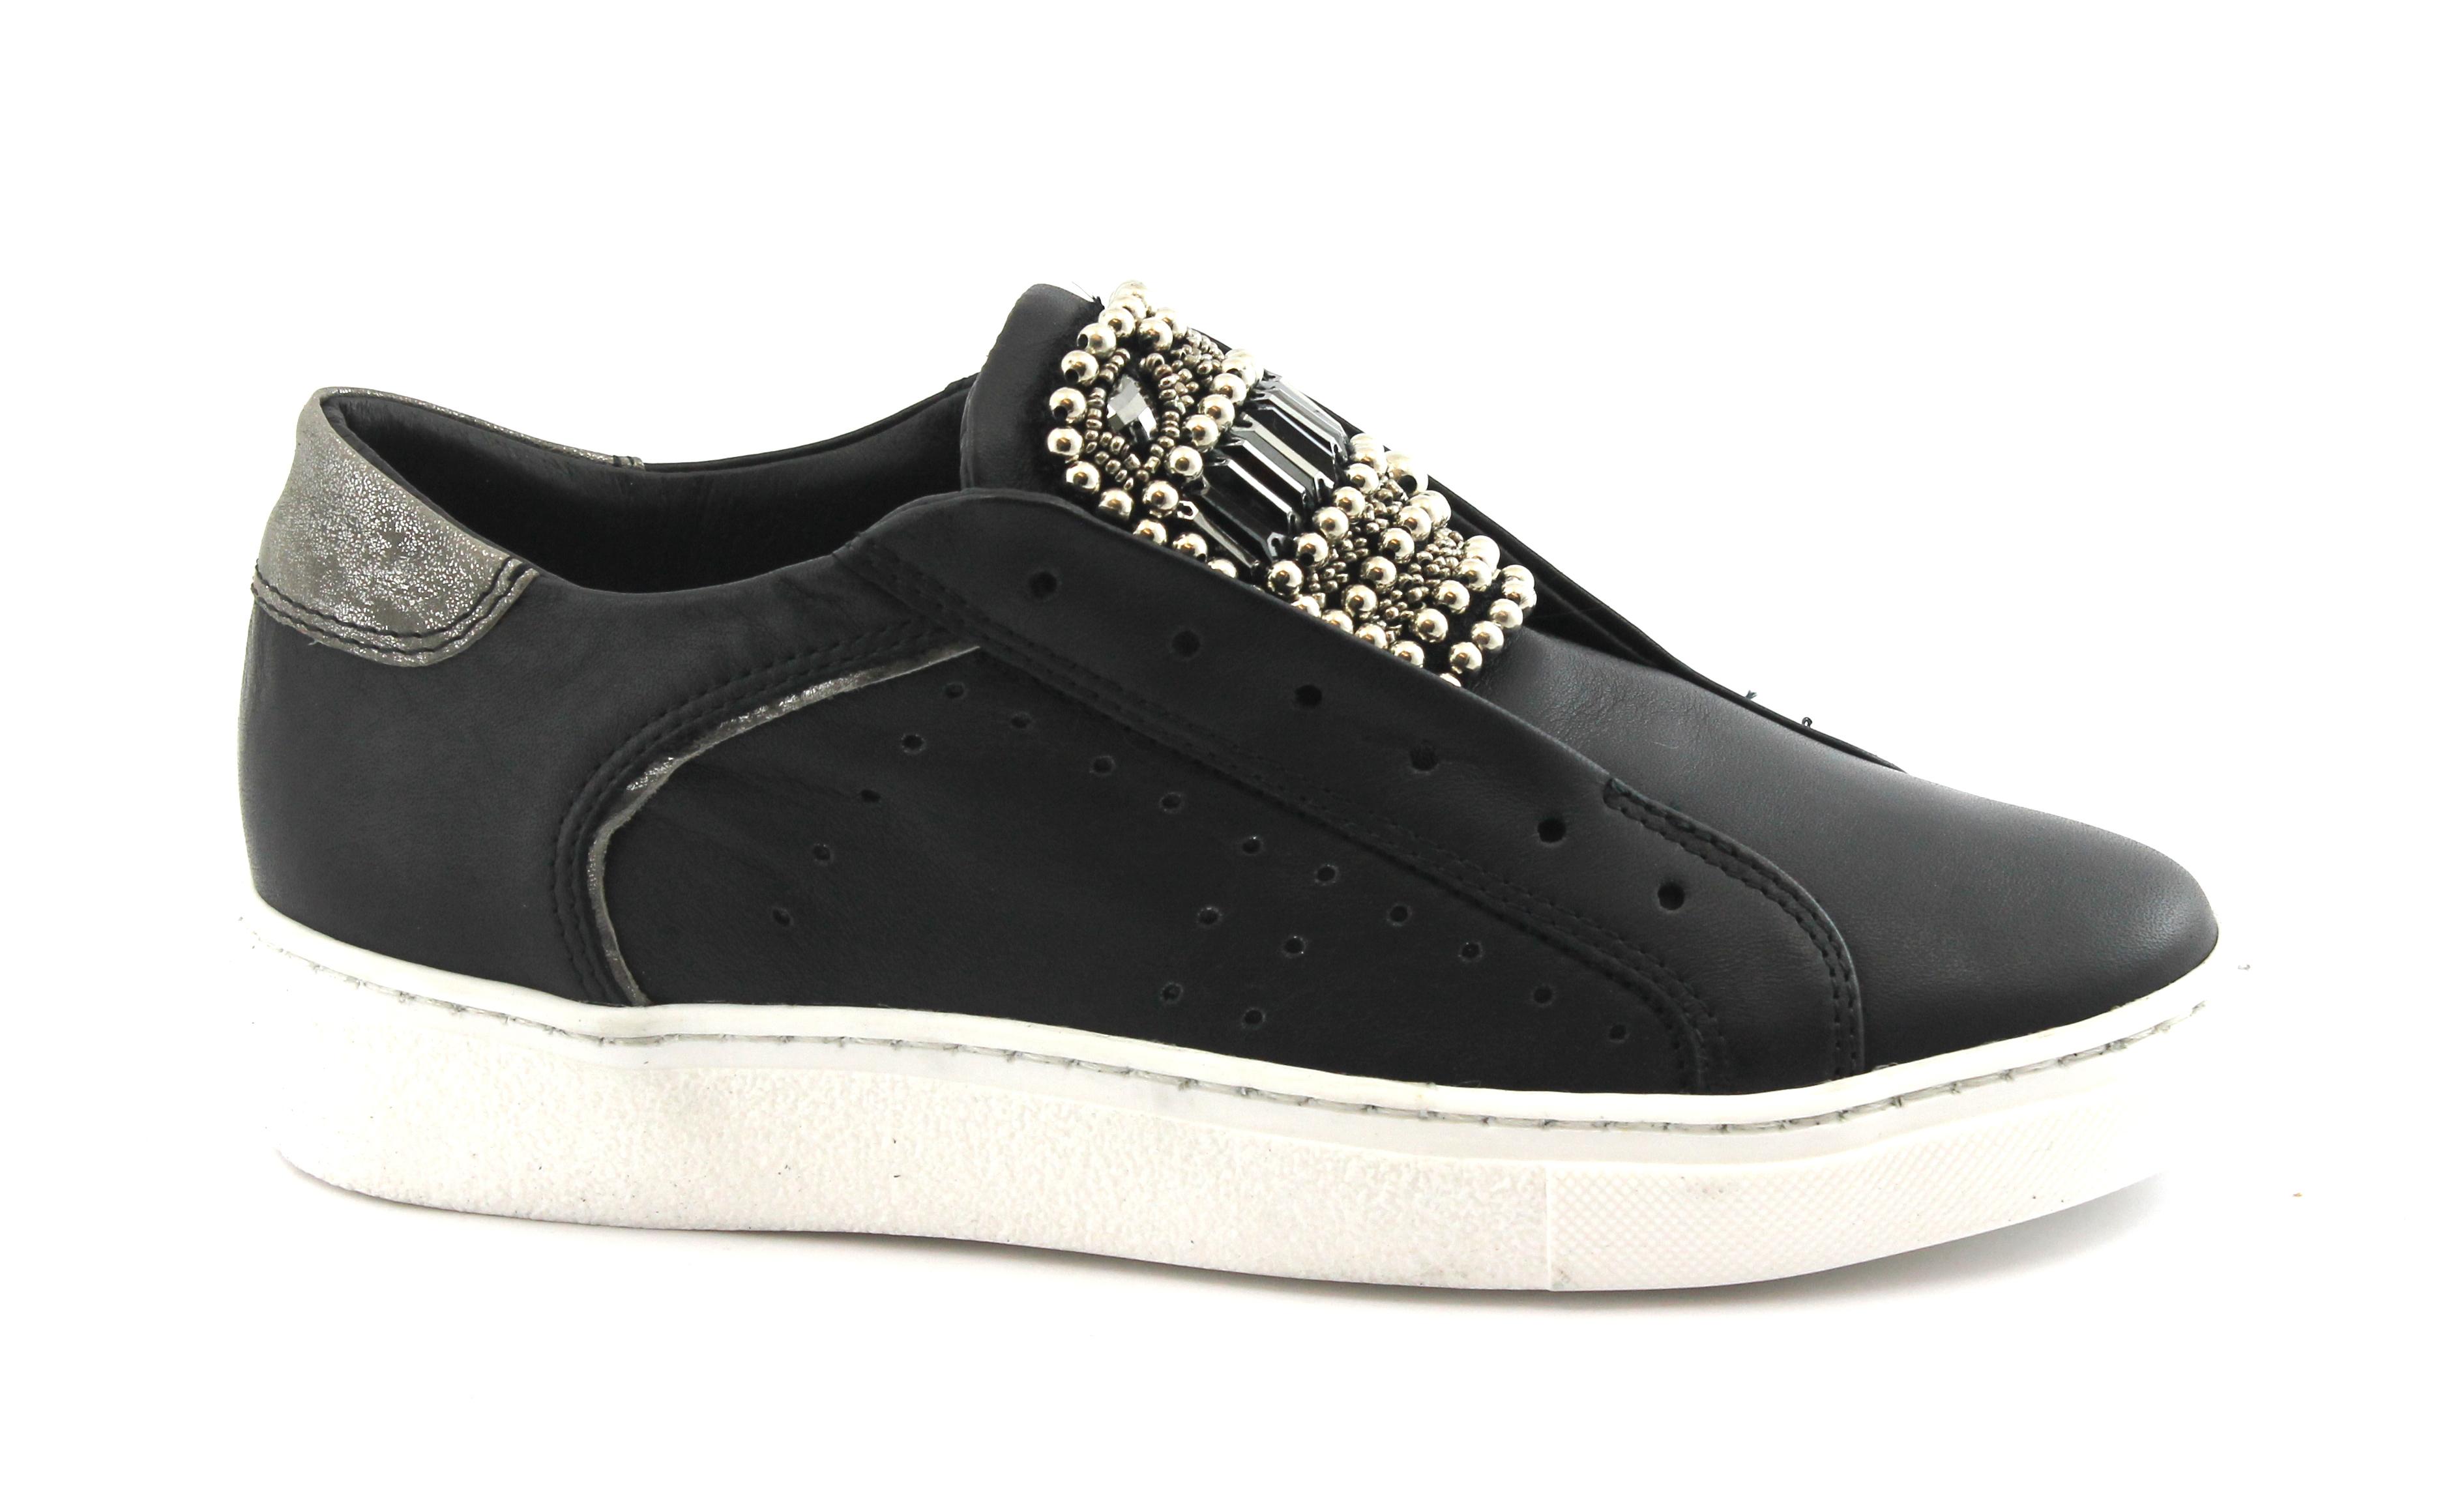 Slip Nero Sneakers Pelle Nay'e Scarpe Donna 1a63450 On Sportive Yf6g7yvb